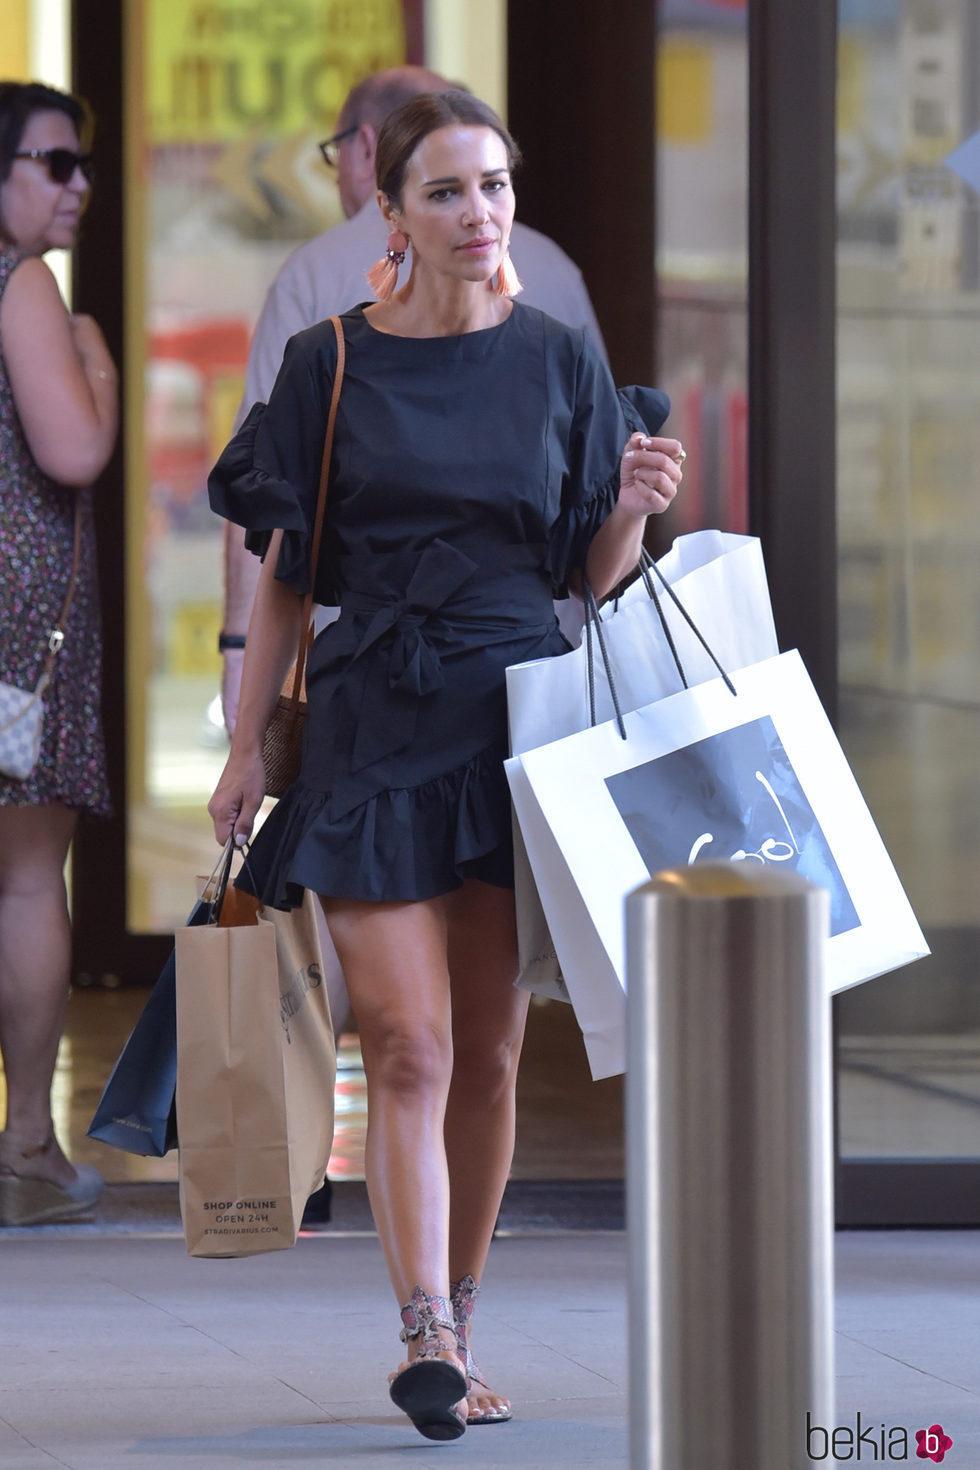 Paula Echevarría saliendo de un centro comercial